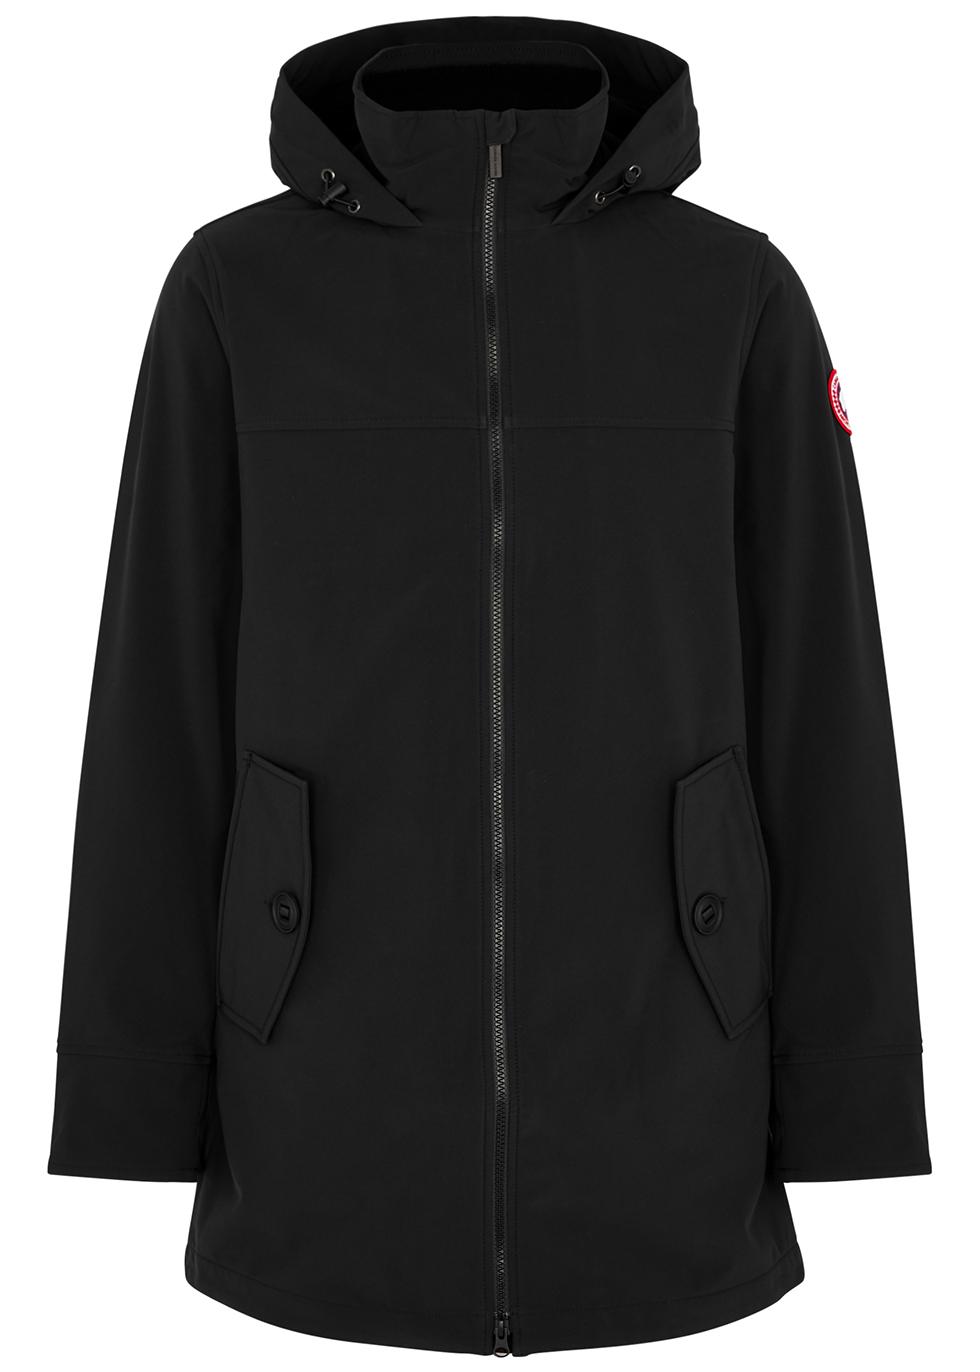 Kent black Tri-Durance shell jacket